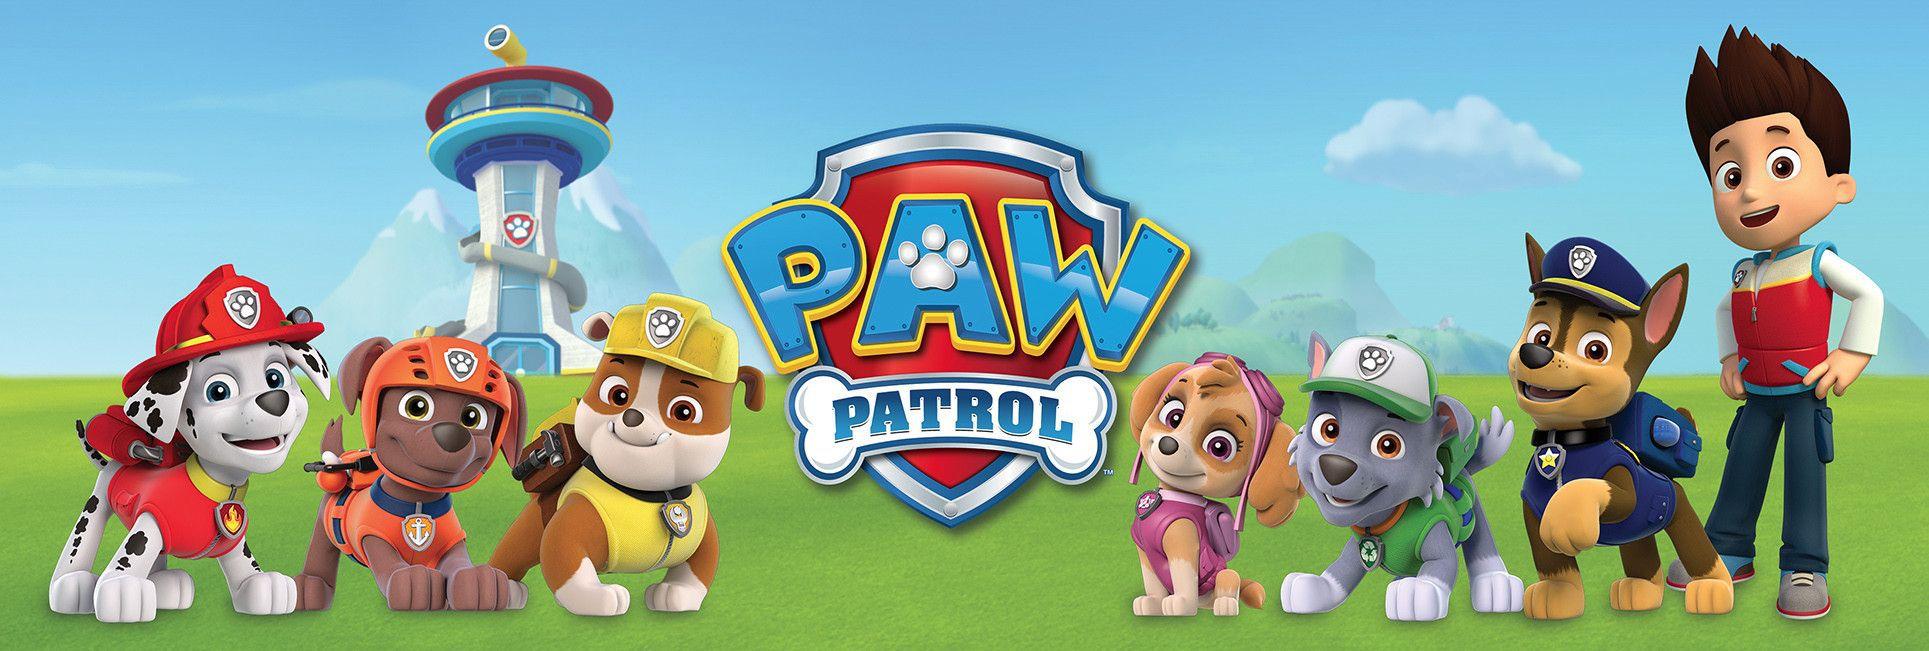 tablette educative paw patrol